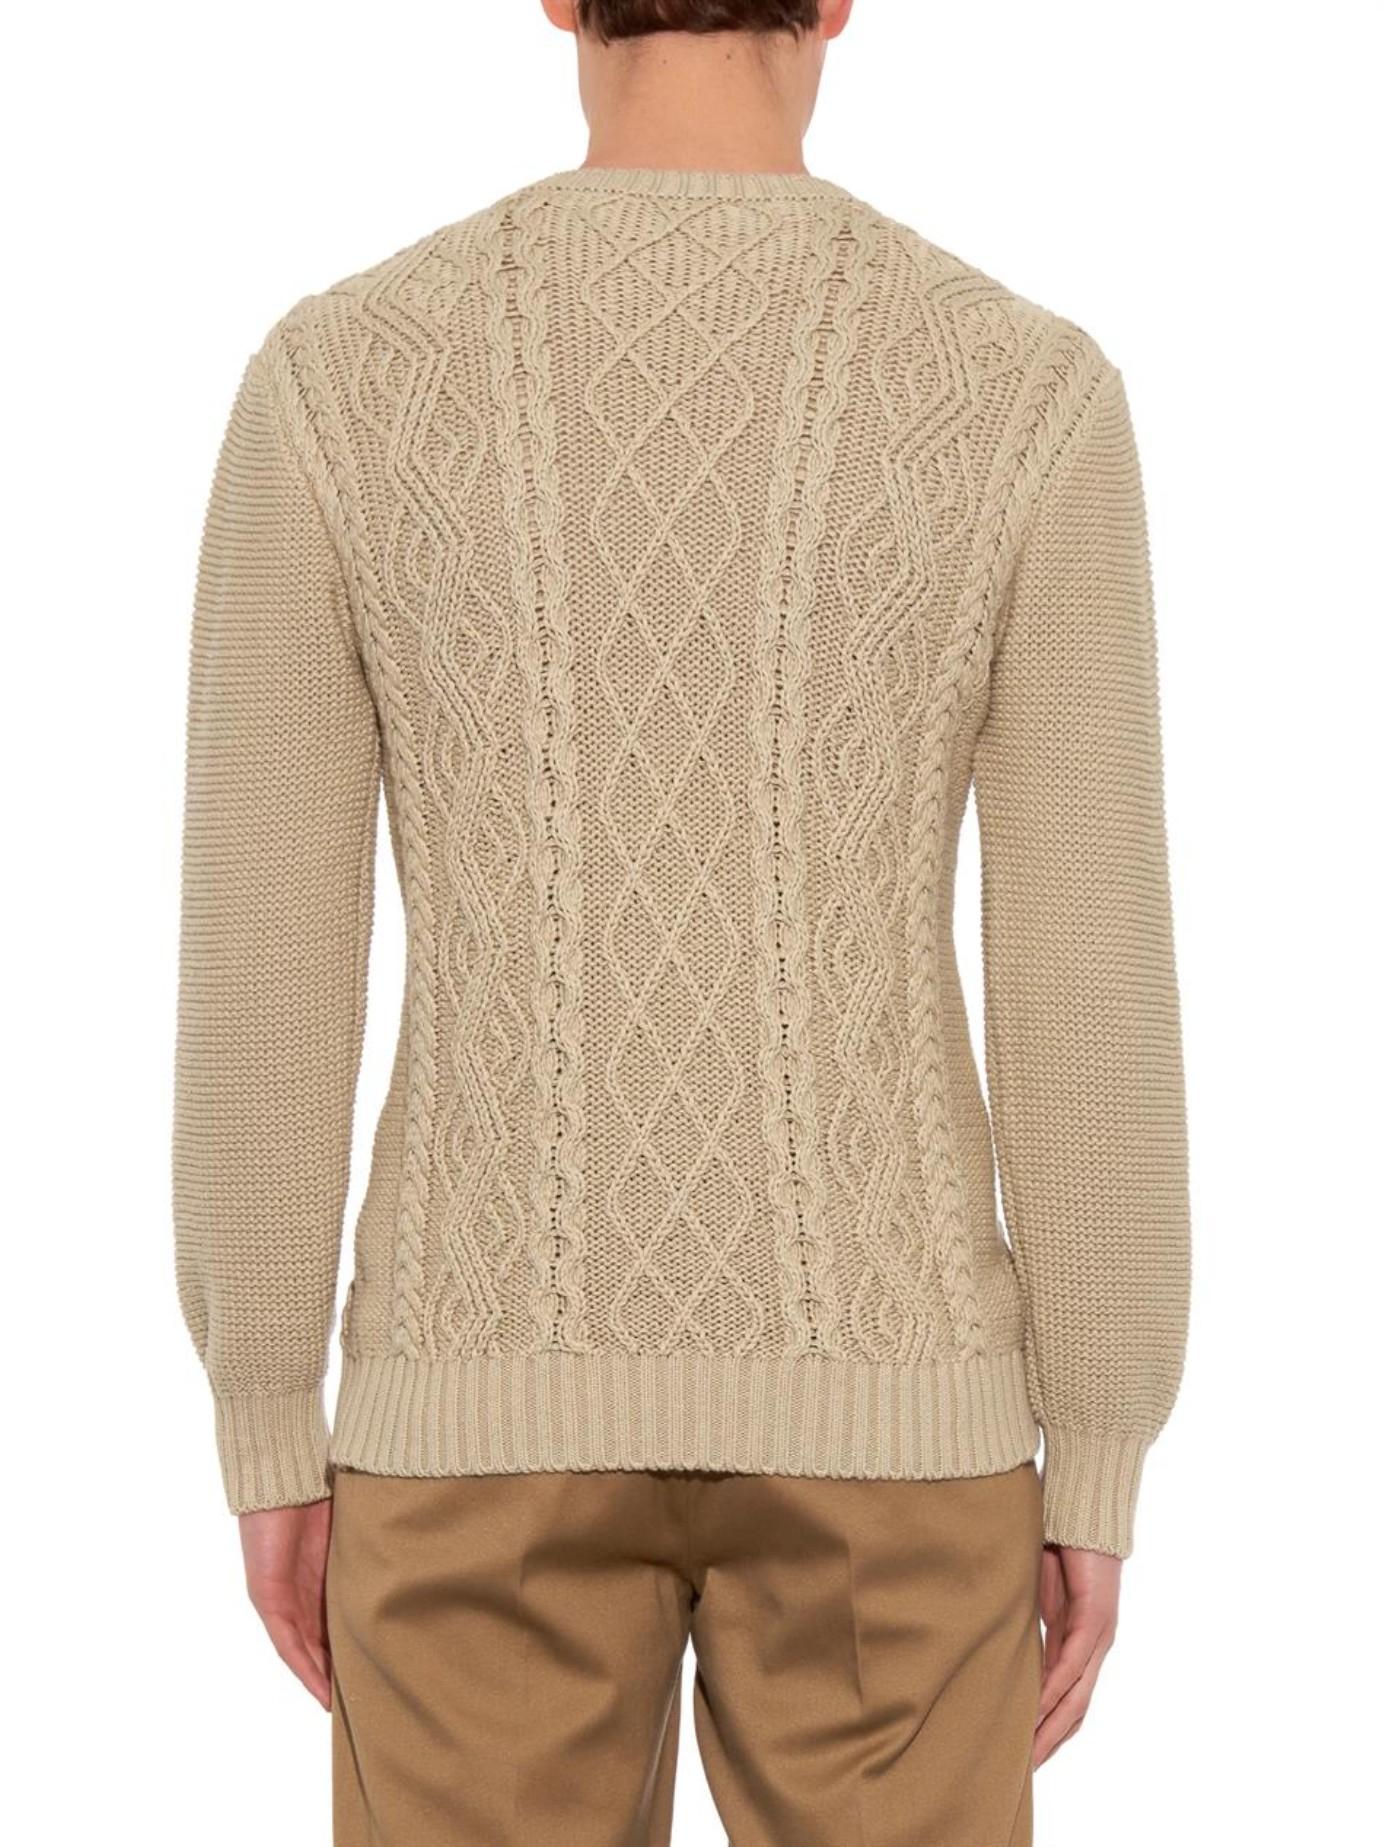 Inis meain Aran-Knit Crew-Neck Sweater in Natural for Men ...